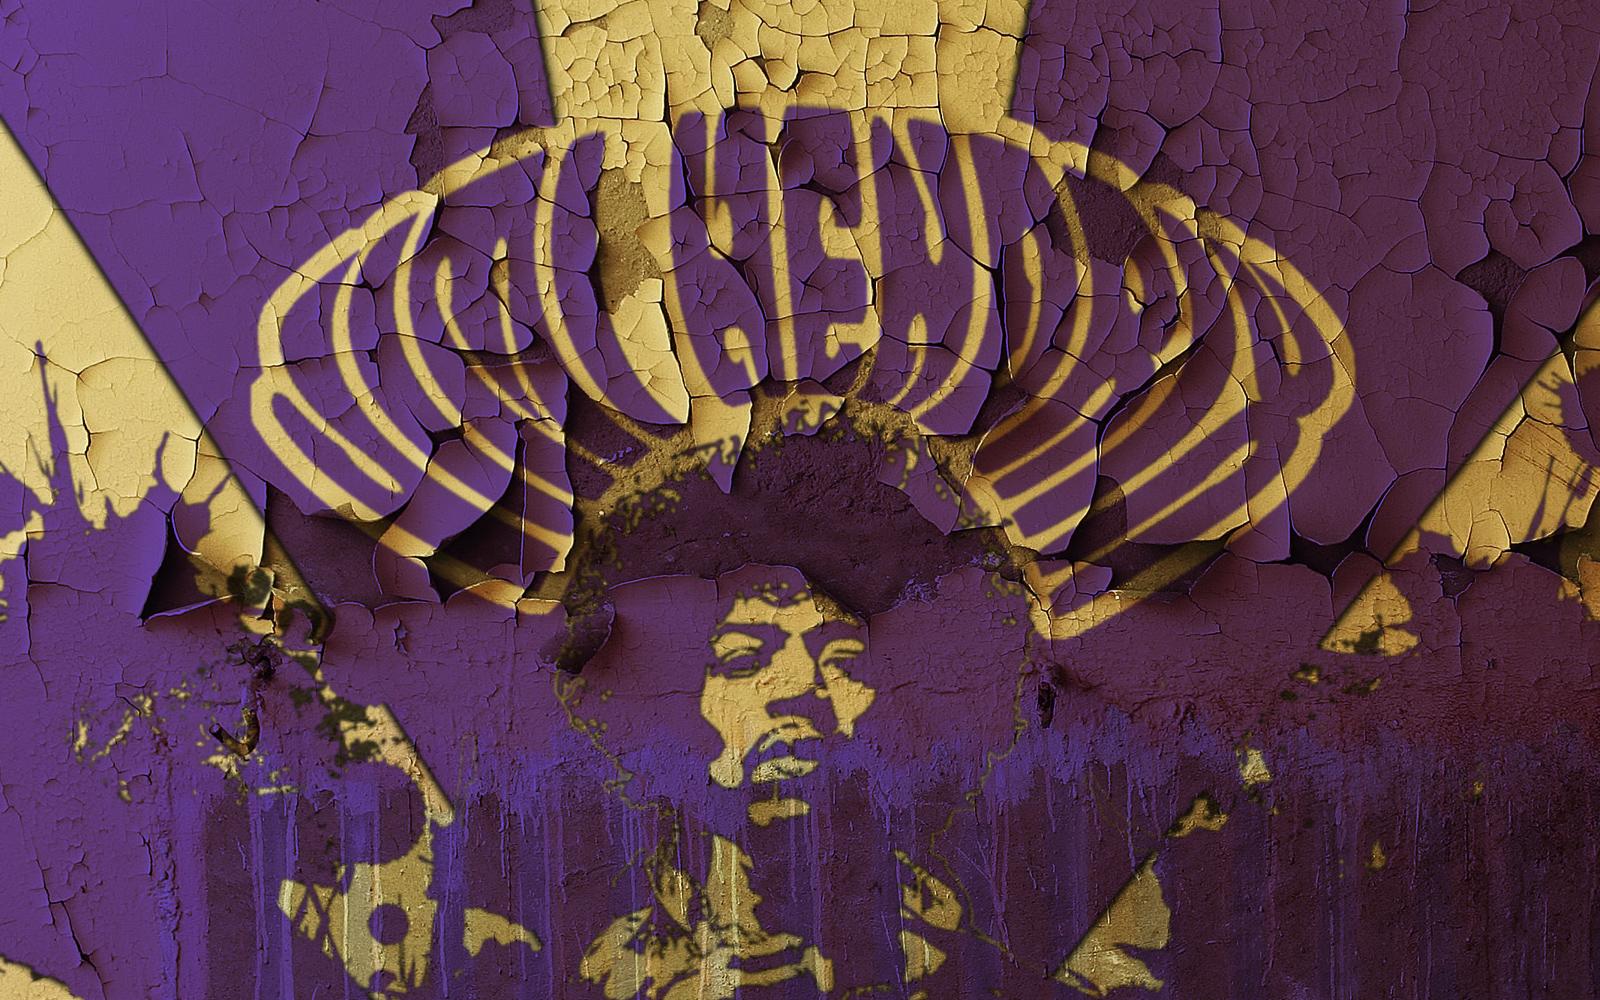 Jimi Hendrix Wallpaper 1080p Jimi Hendrix Wallpaper 2